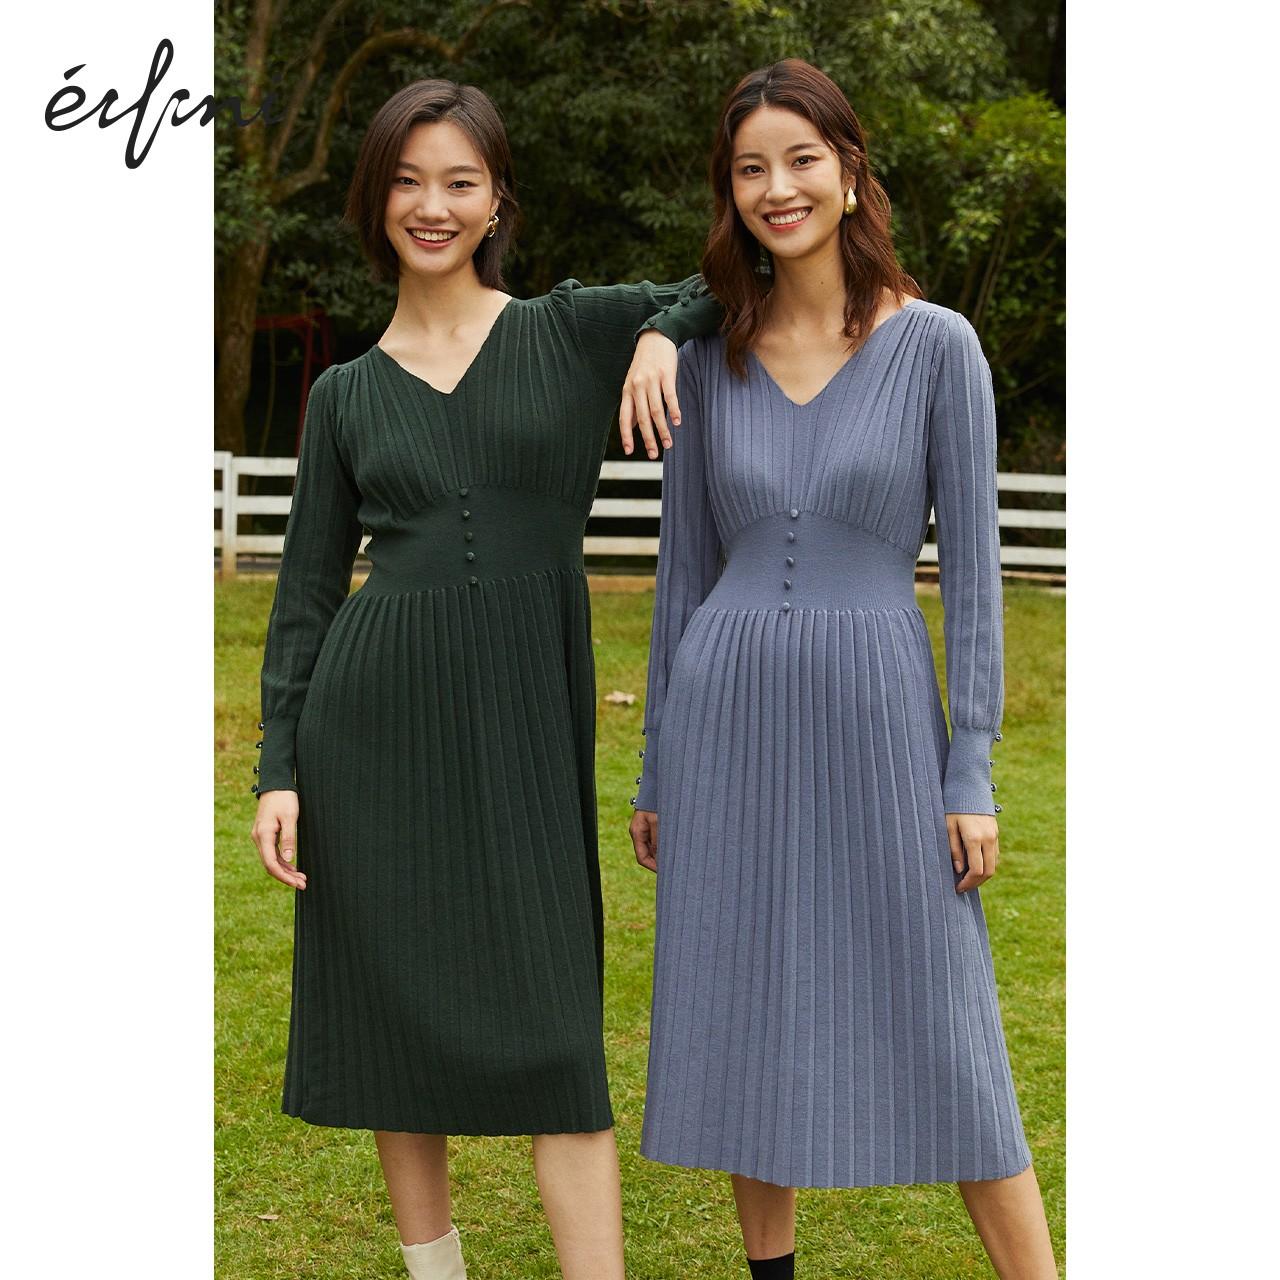 Eifini 伊芙丽 1BA998711 女士连衣裙